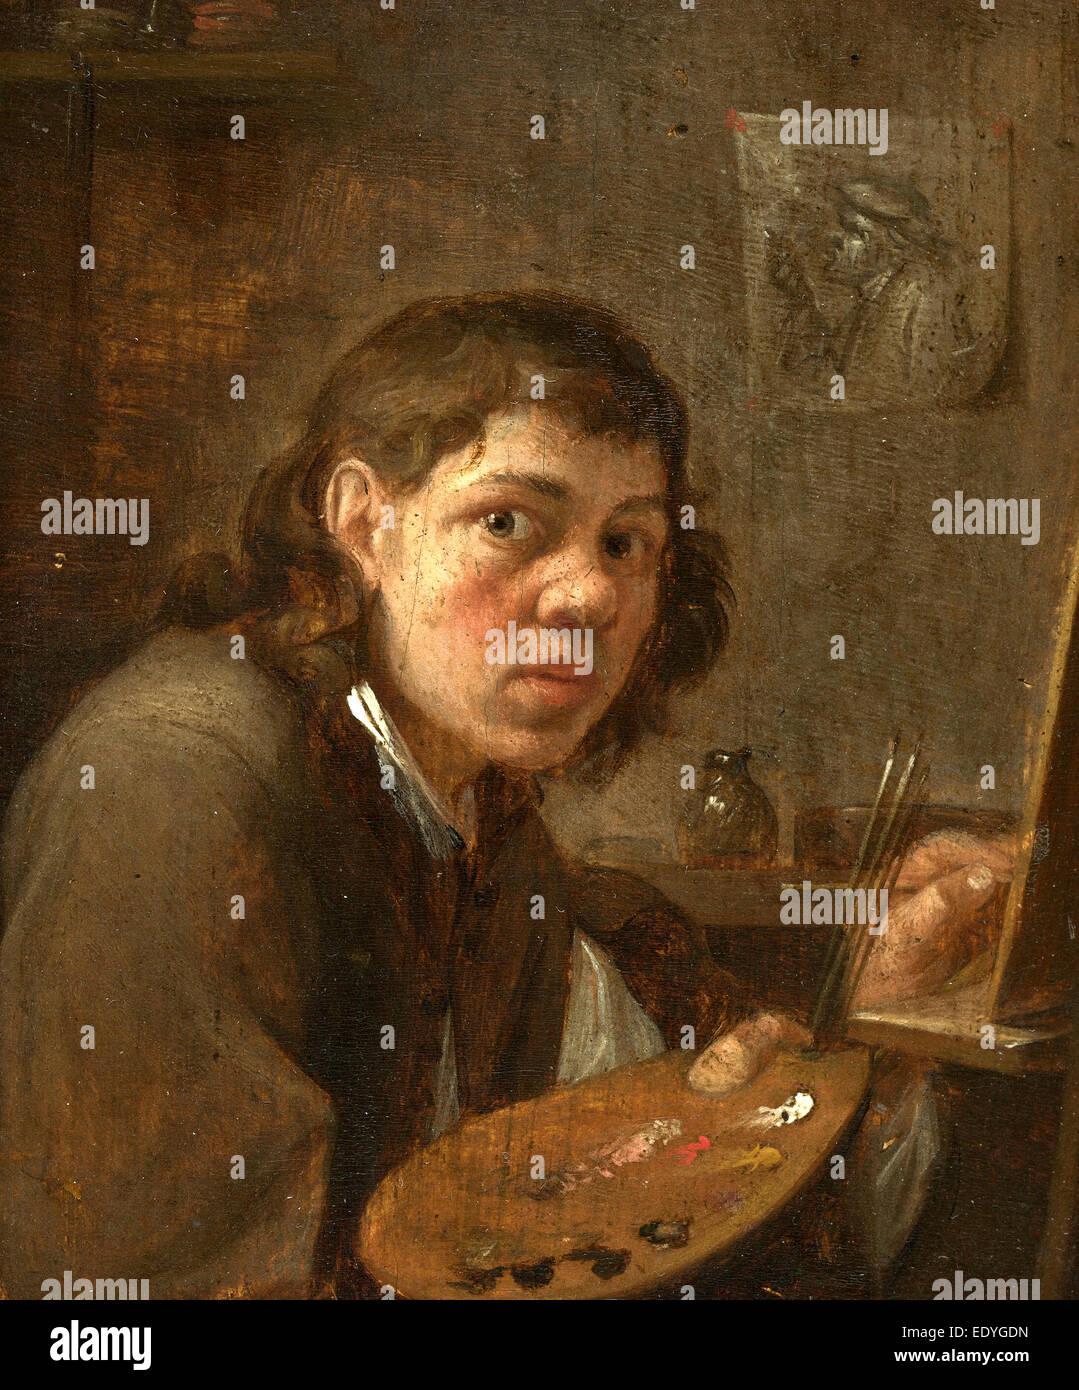 Gillis van Tilborgh the Younger, Self-Portrait in the Studio, Flemish, c. 1625 - c. 1678, c. 1645, oil on panel - Stock Image